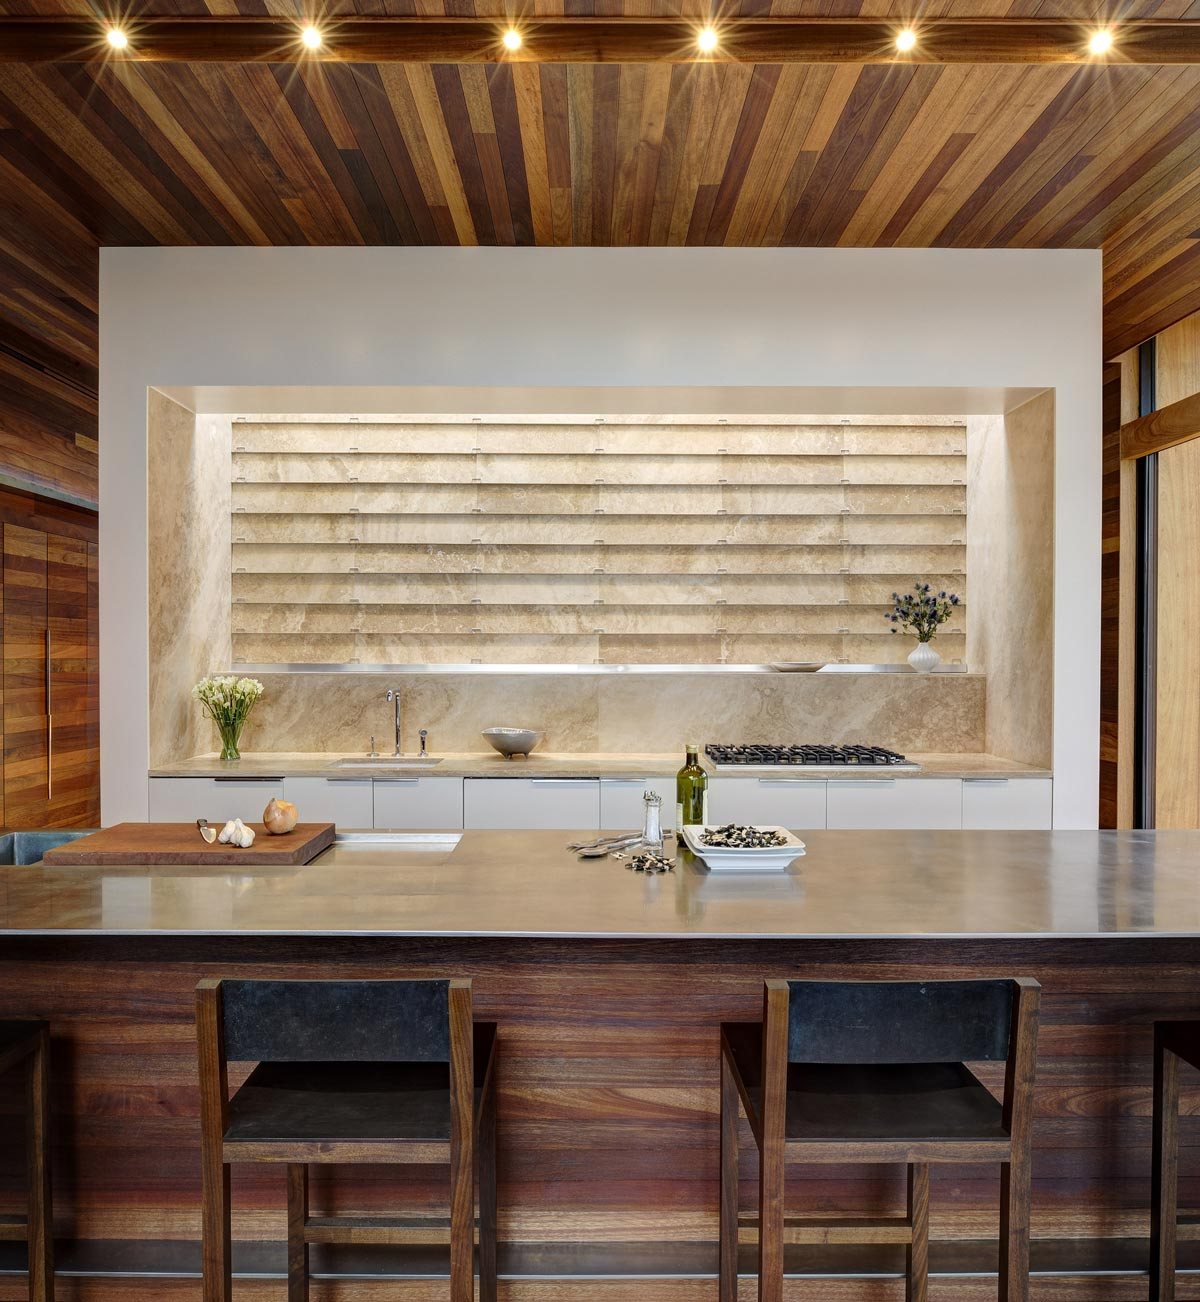 Modern Kitchen, Sam's Creek in Bridgehampton, New York by Bates Masi Architects